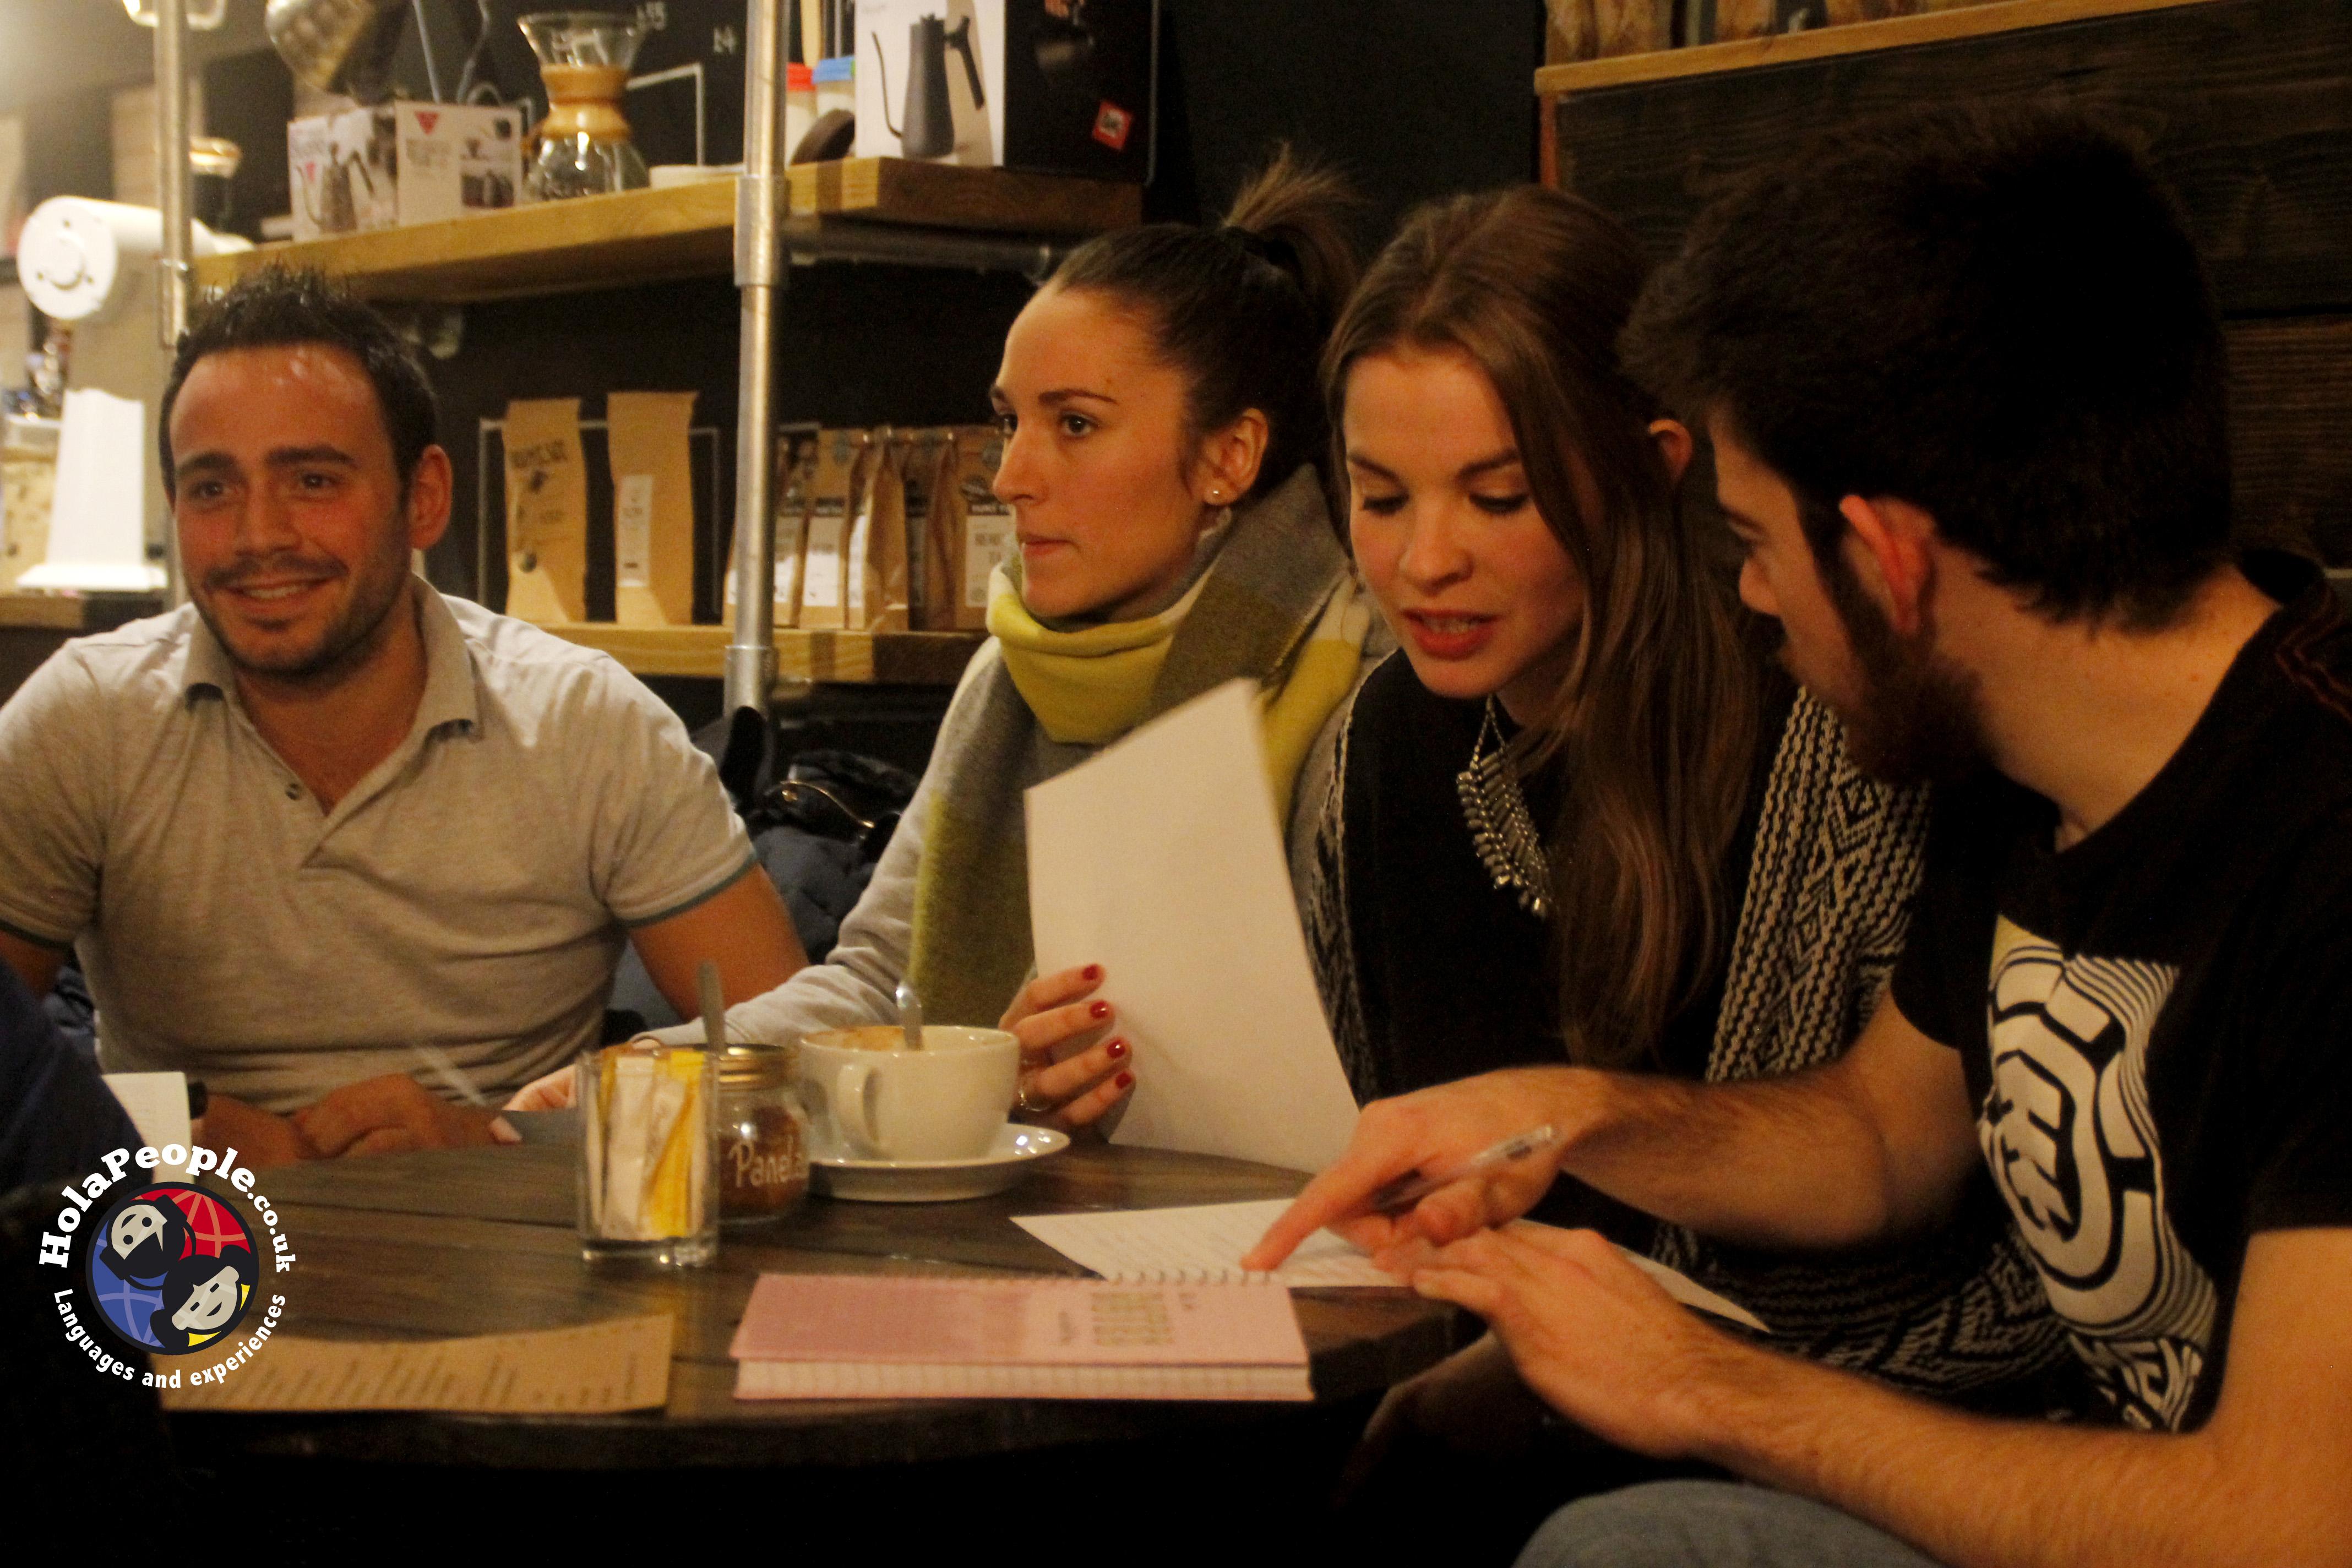 Social language learning